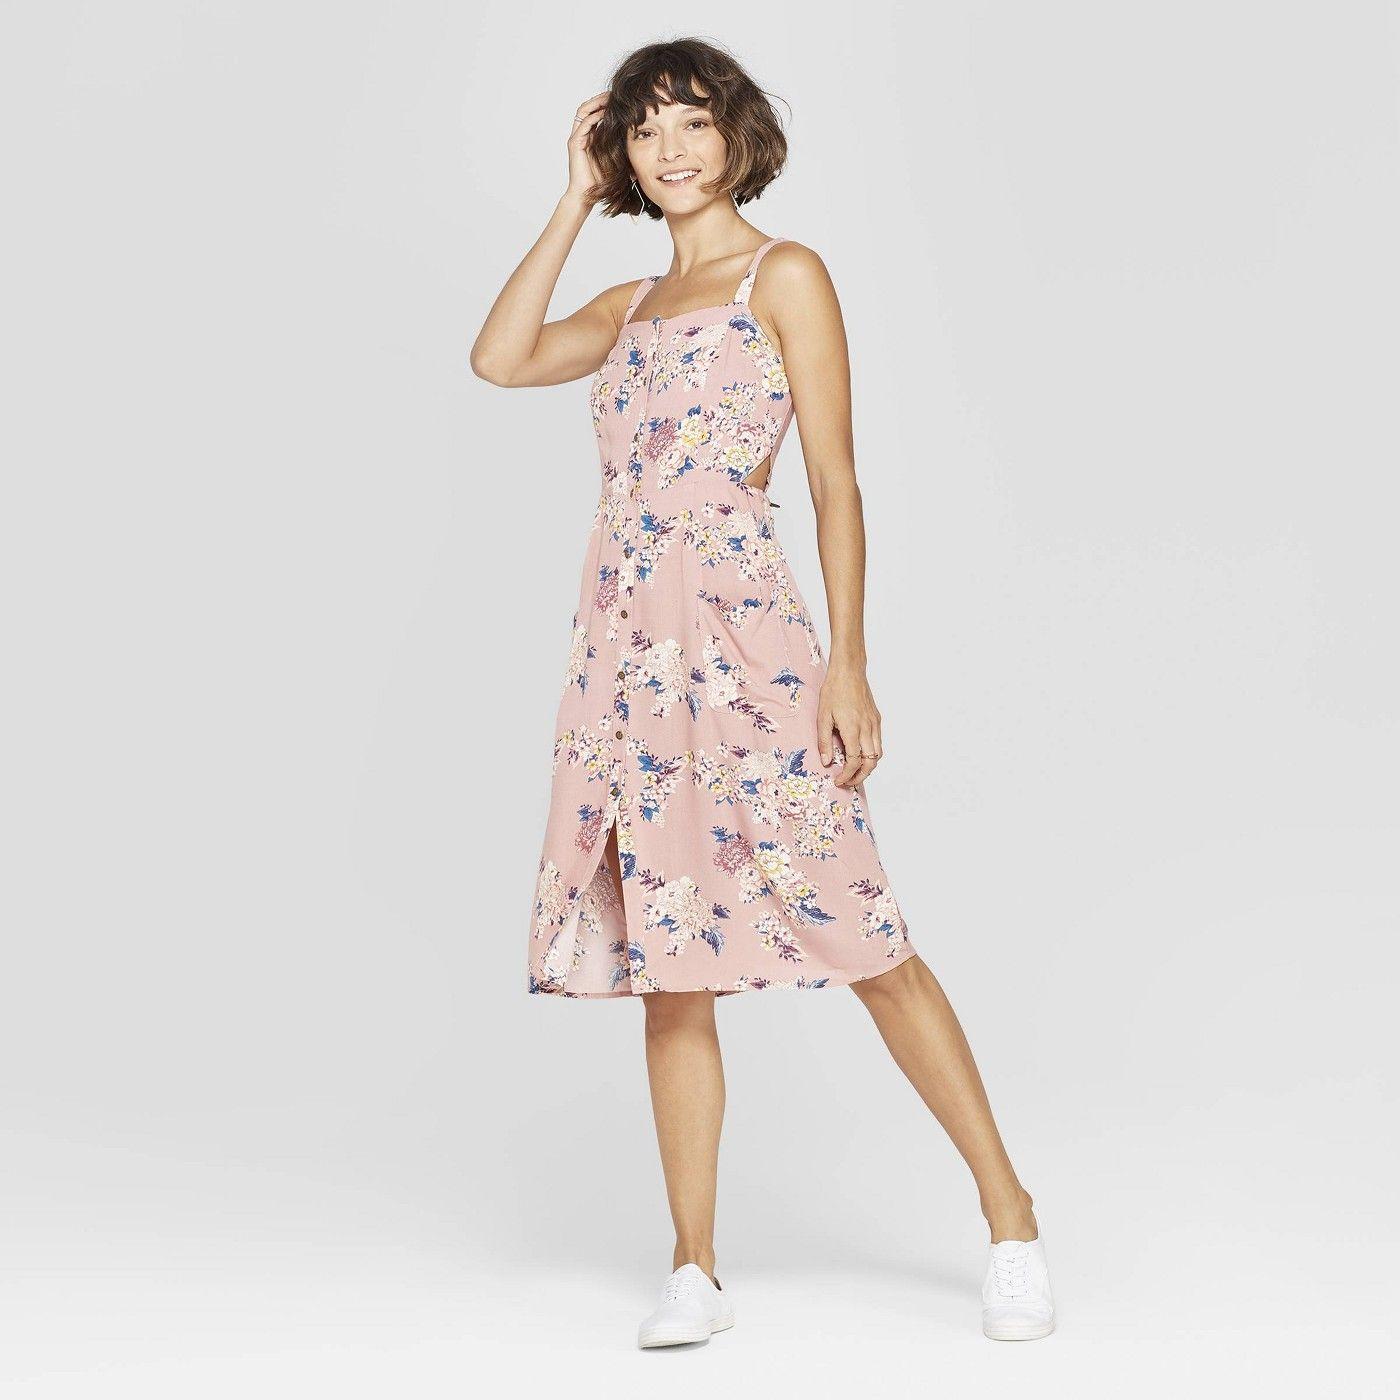 Women S Floral Print Square Neck Strappy Button Front Midi Dress Xhilaration Rose Target Pink Spring Fashion Fashion Dresses [ 1400 x 1400 Pixel ]